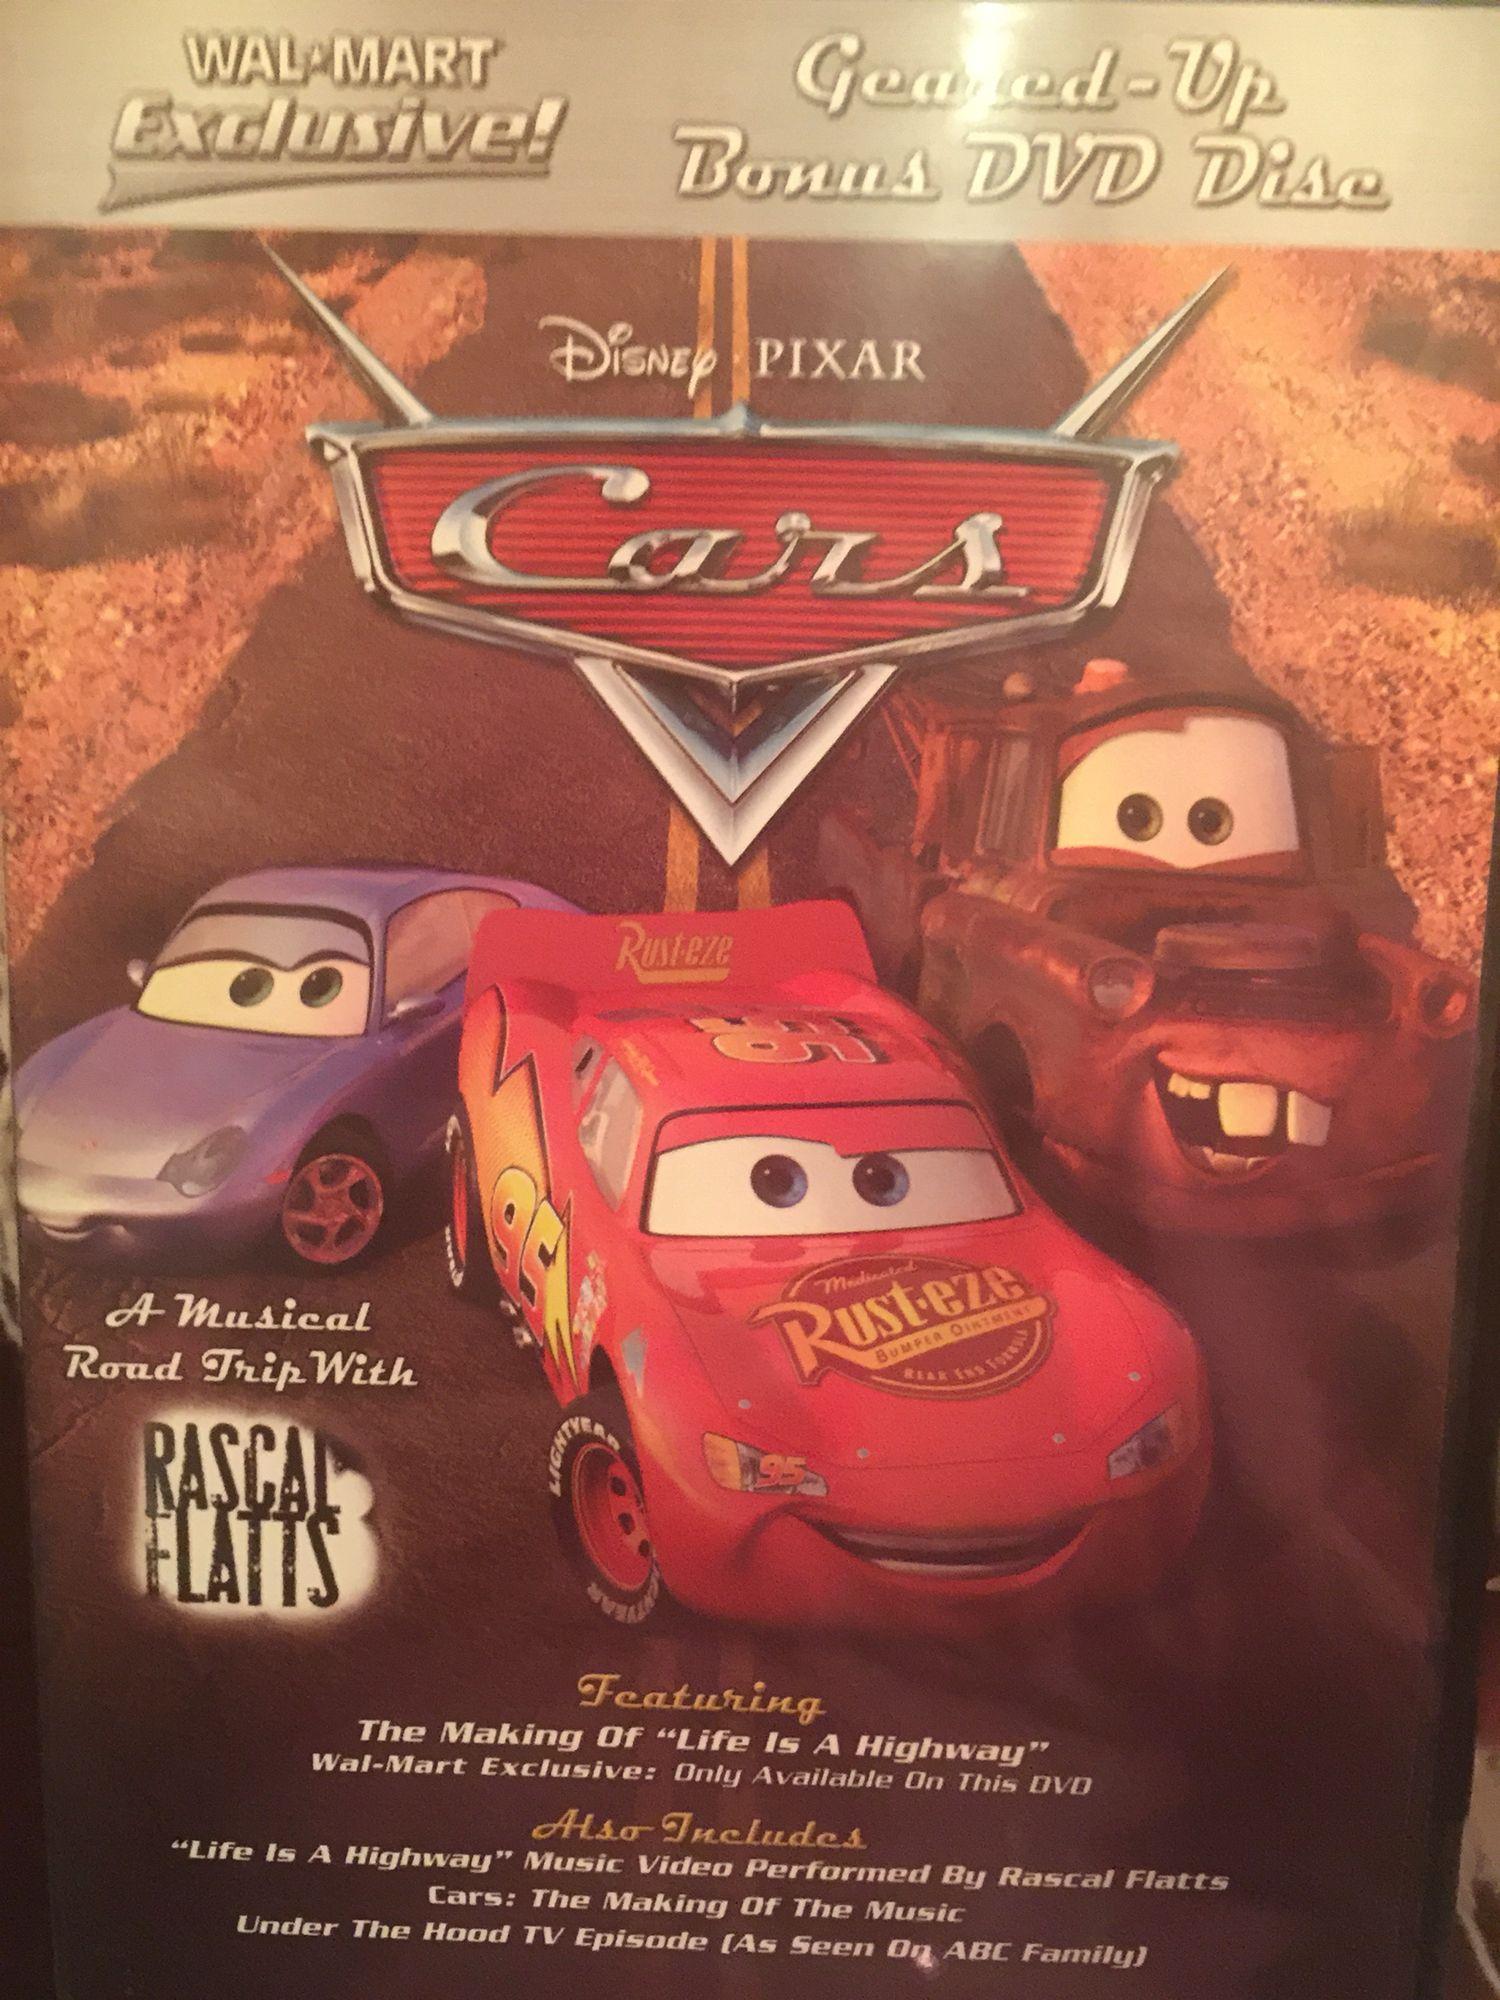 Walmart Exclusive Geared-up bonus DVD Disc Cars (2006